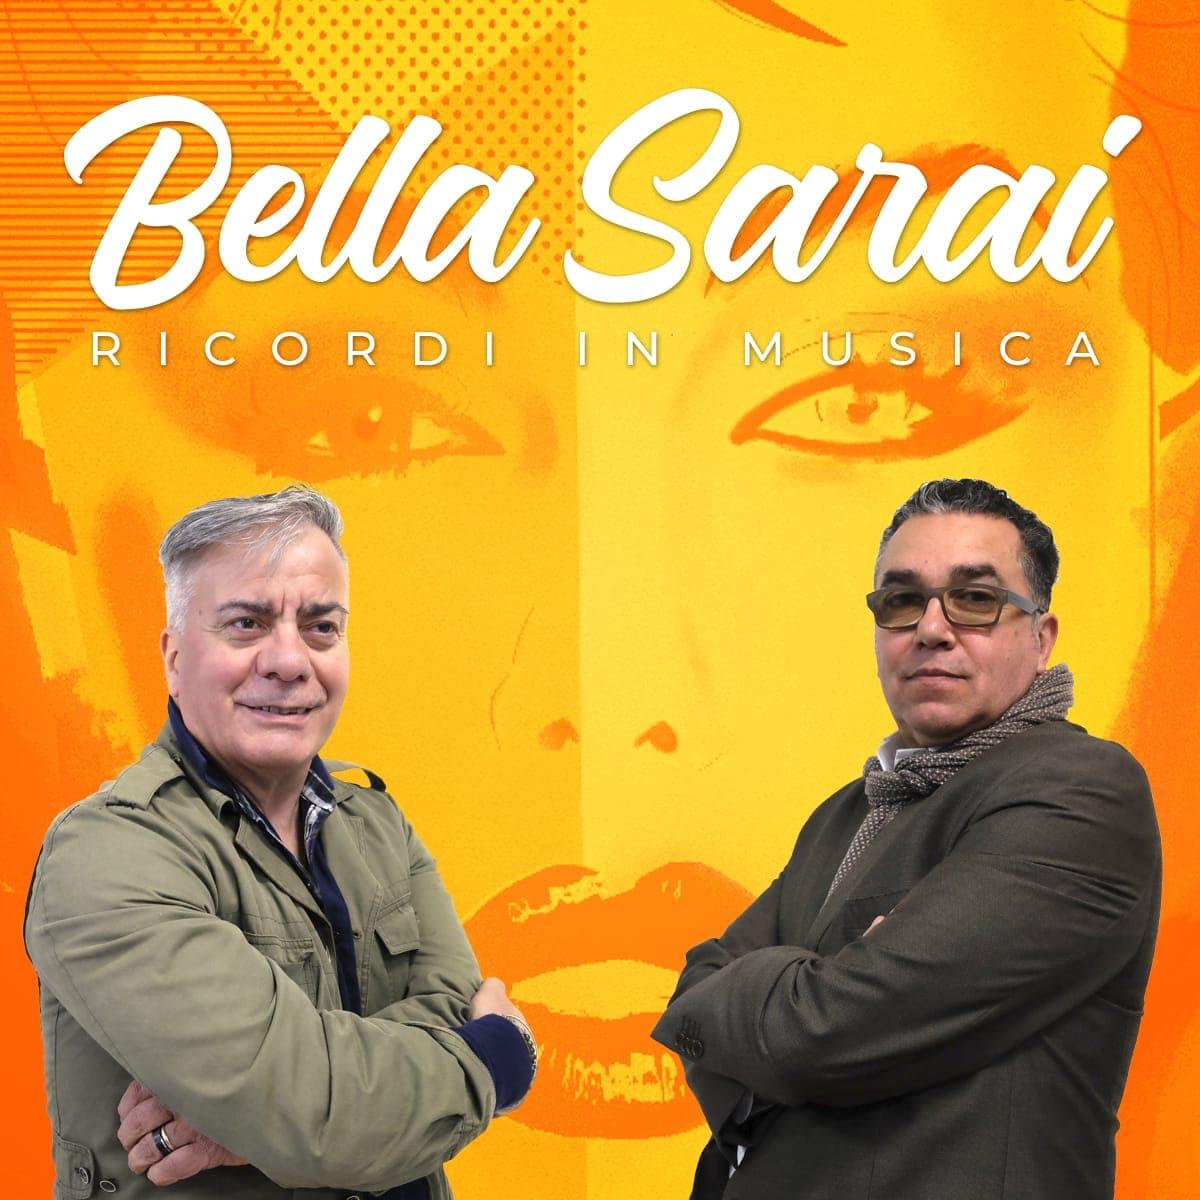 Bella Sarai